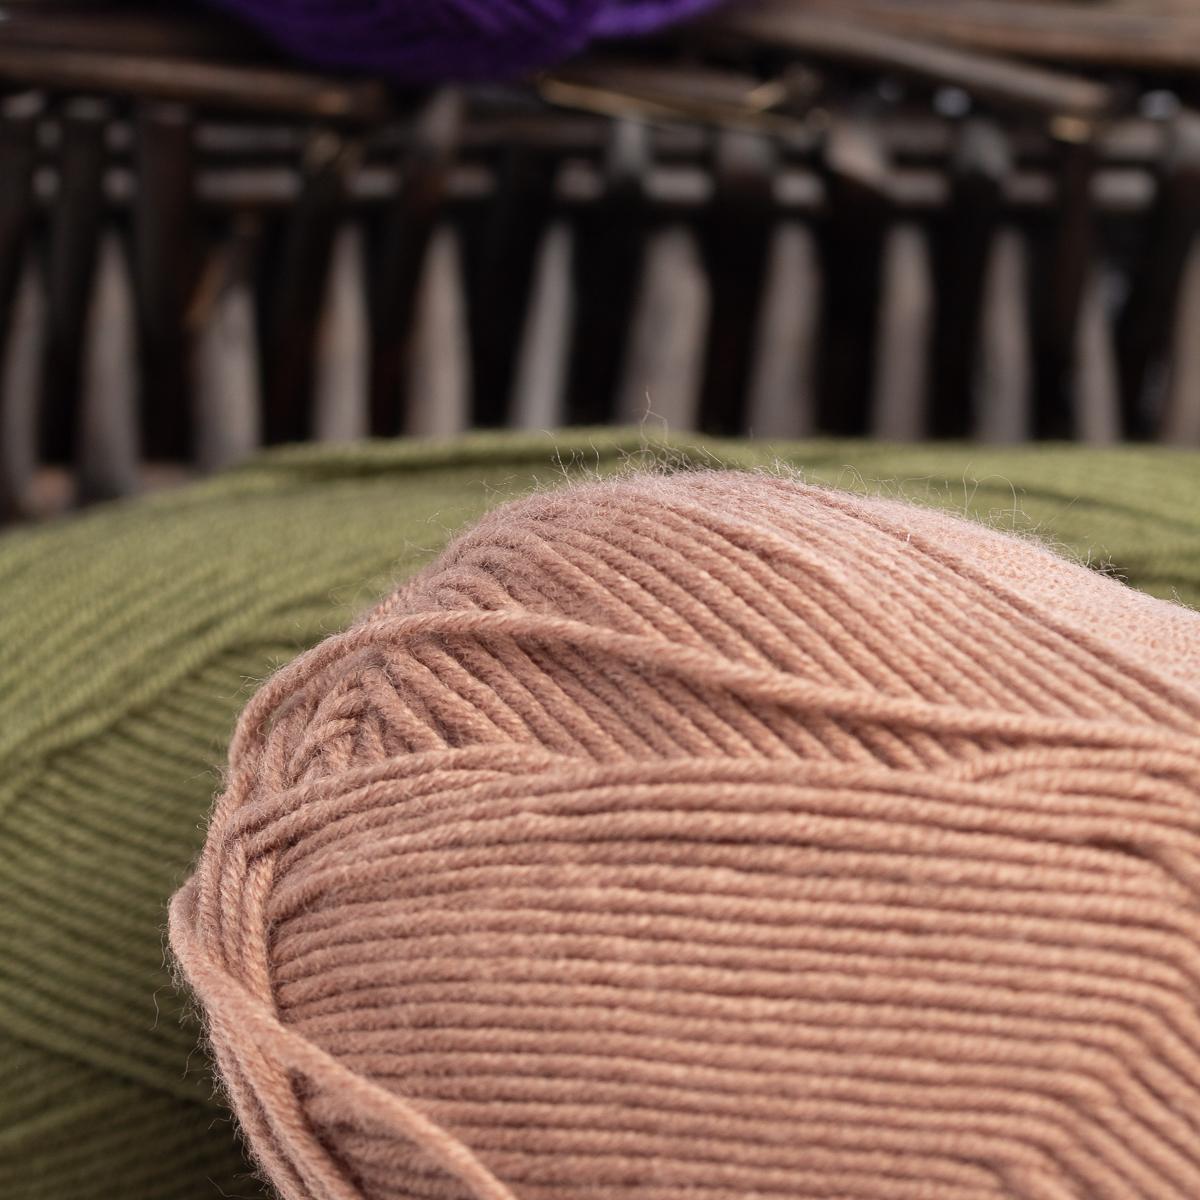 3pk-Lion-Brand-Vanna-039-s-Style-100-Acrylic-Yarn-Light-3-Knit-Crochet-Skeins-Soft thumbnail 17